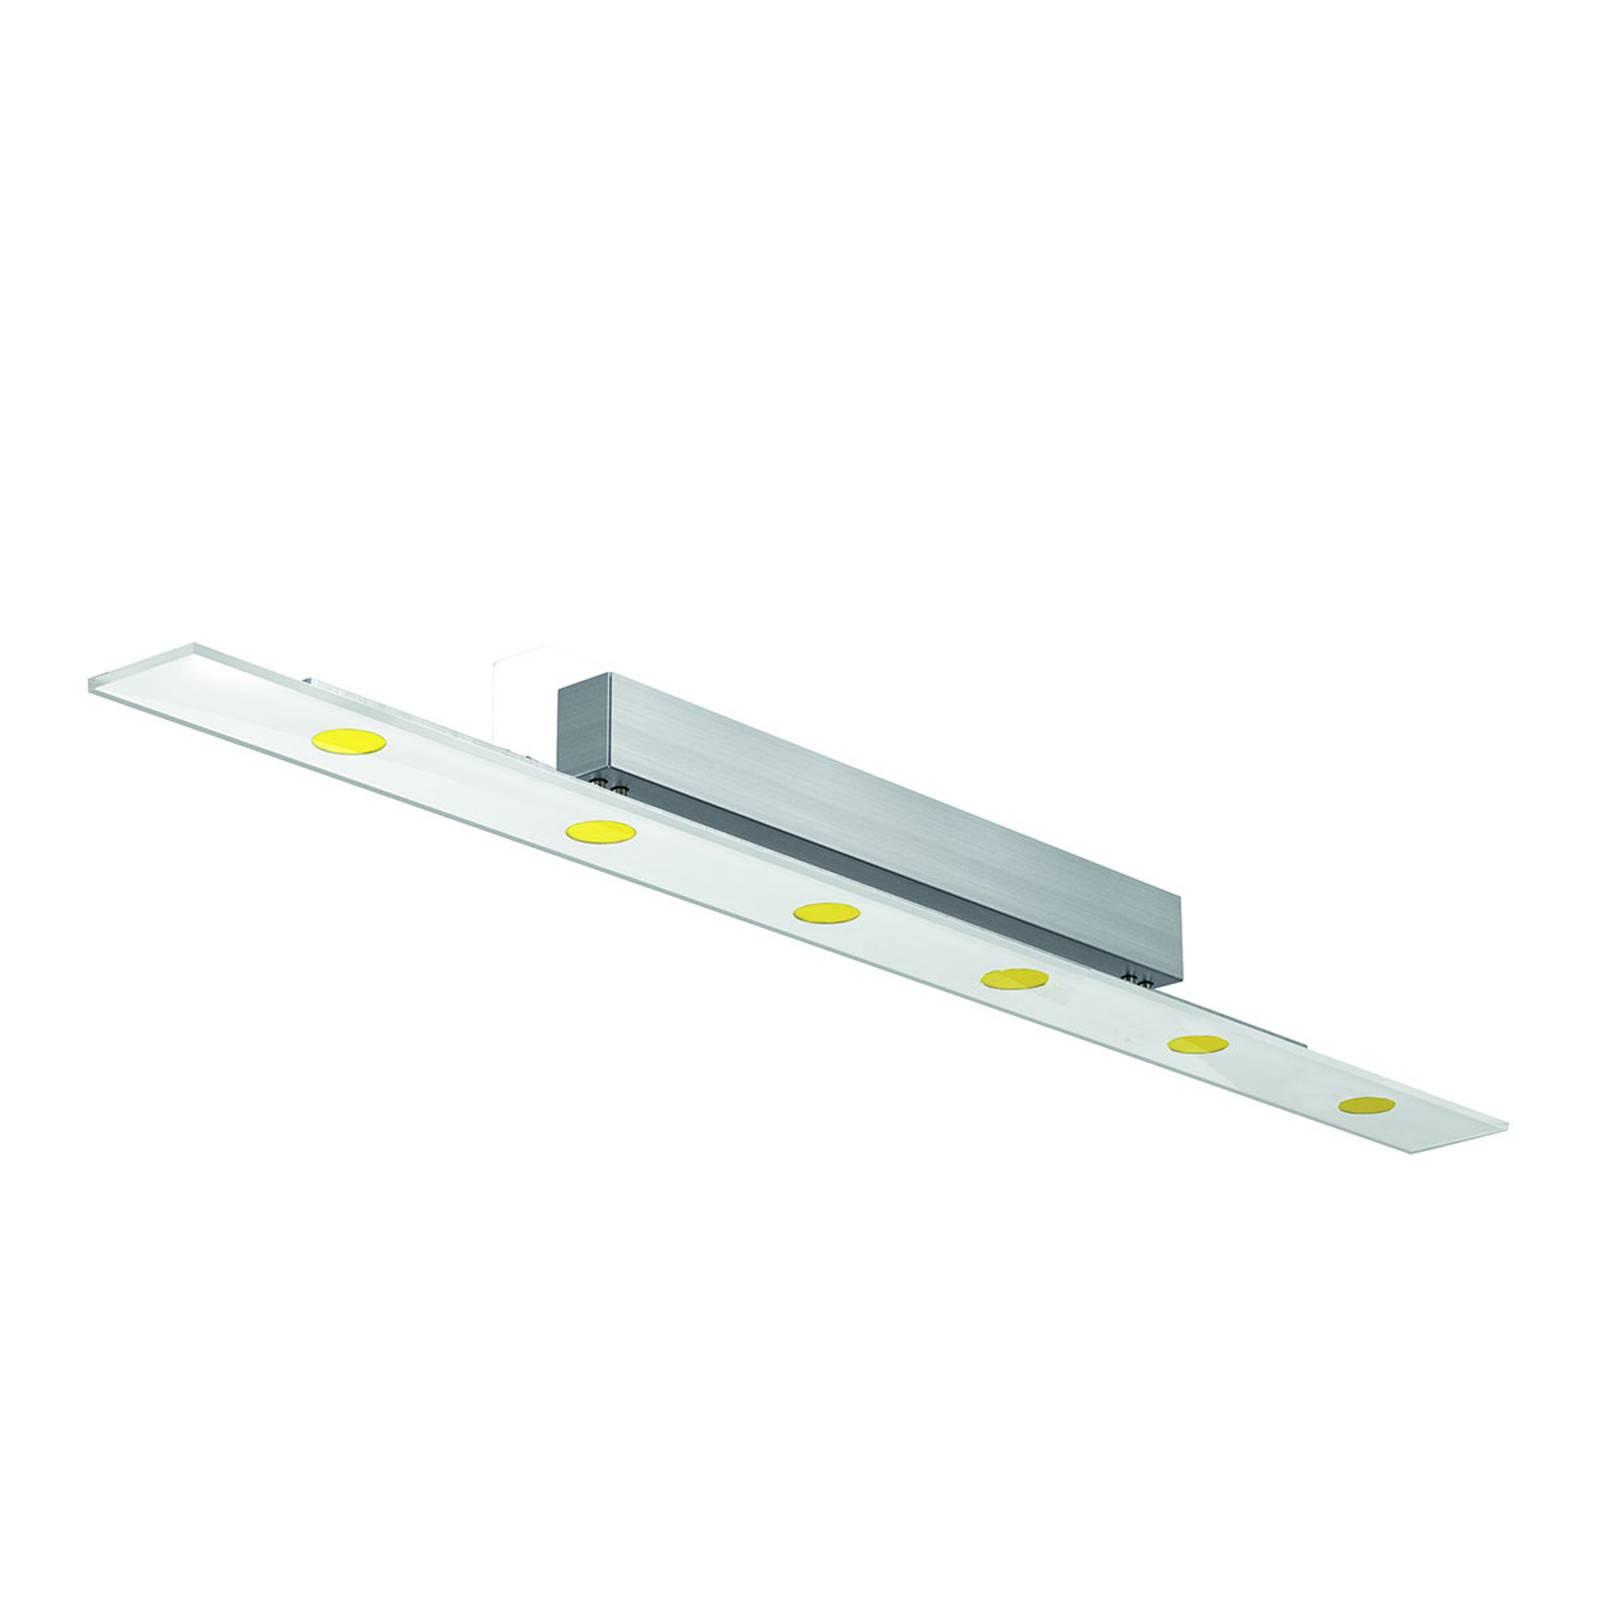 LED-kattovalaisin Sun, ESG-lasi 140 cm